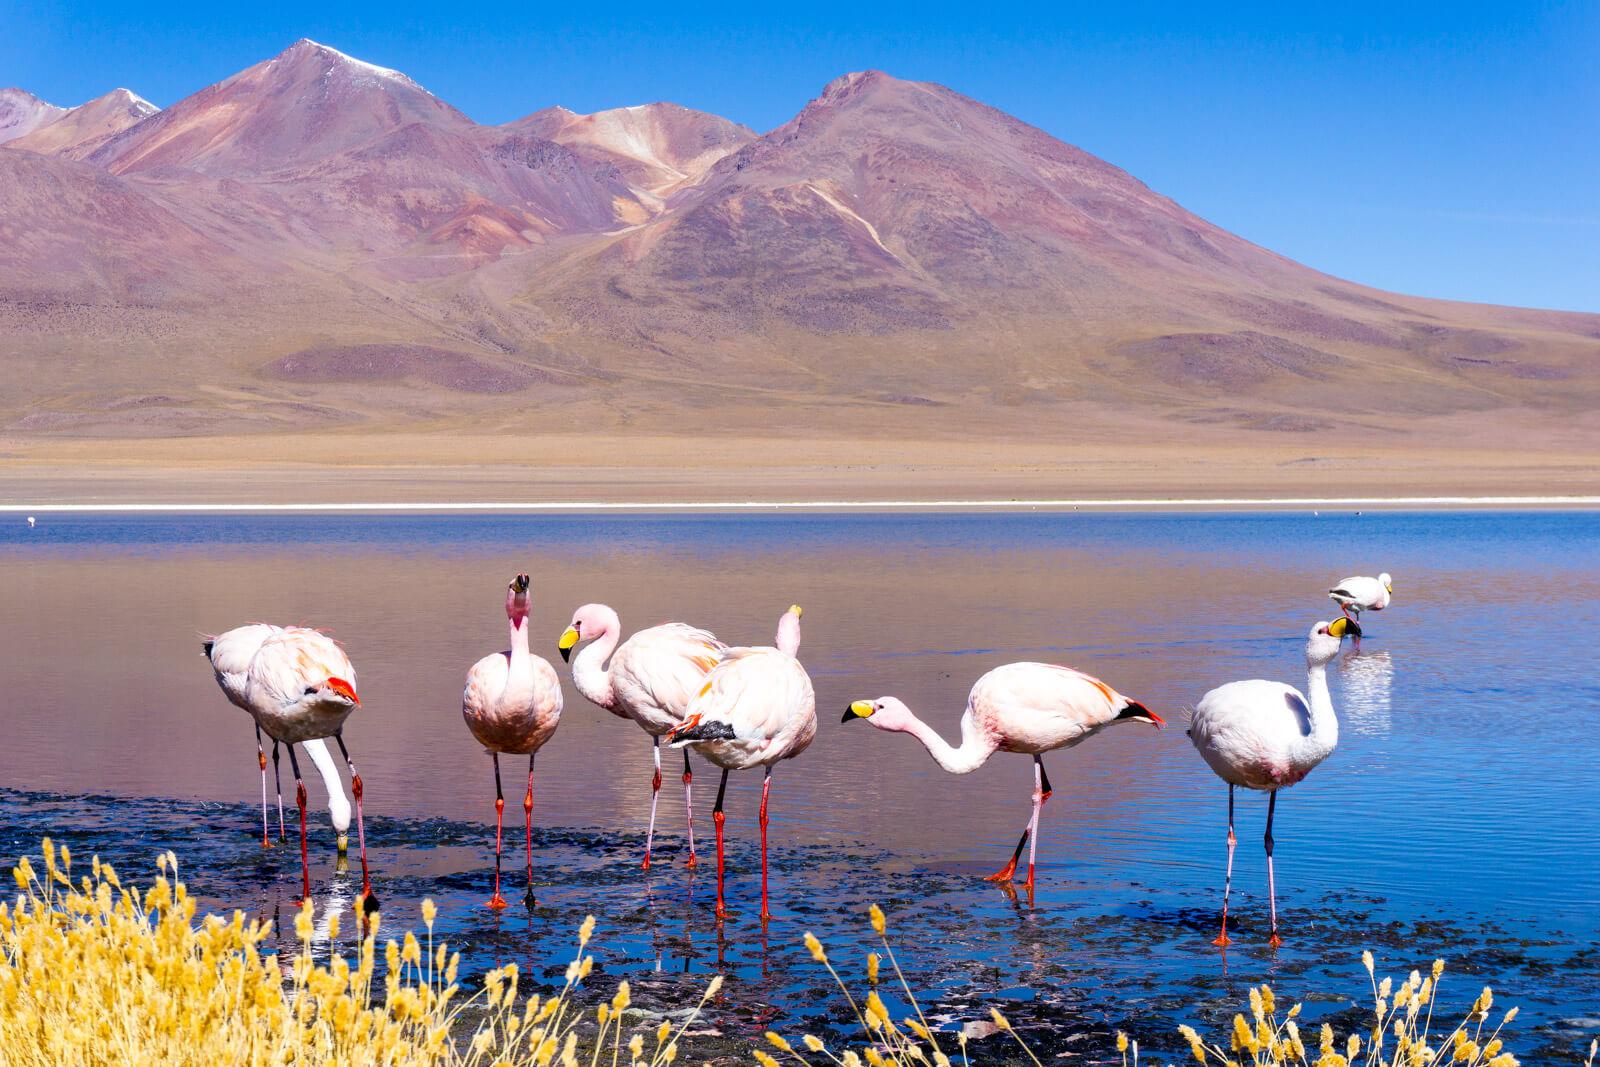 The Flamingos of Bolivia, roadtrip from Atacama to Uyuni